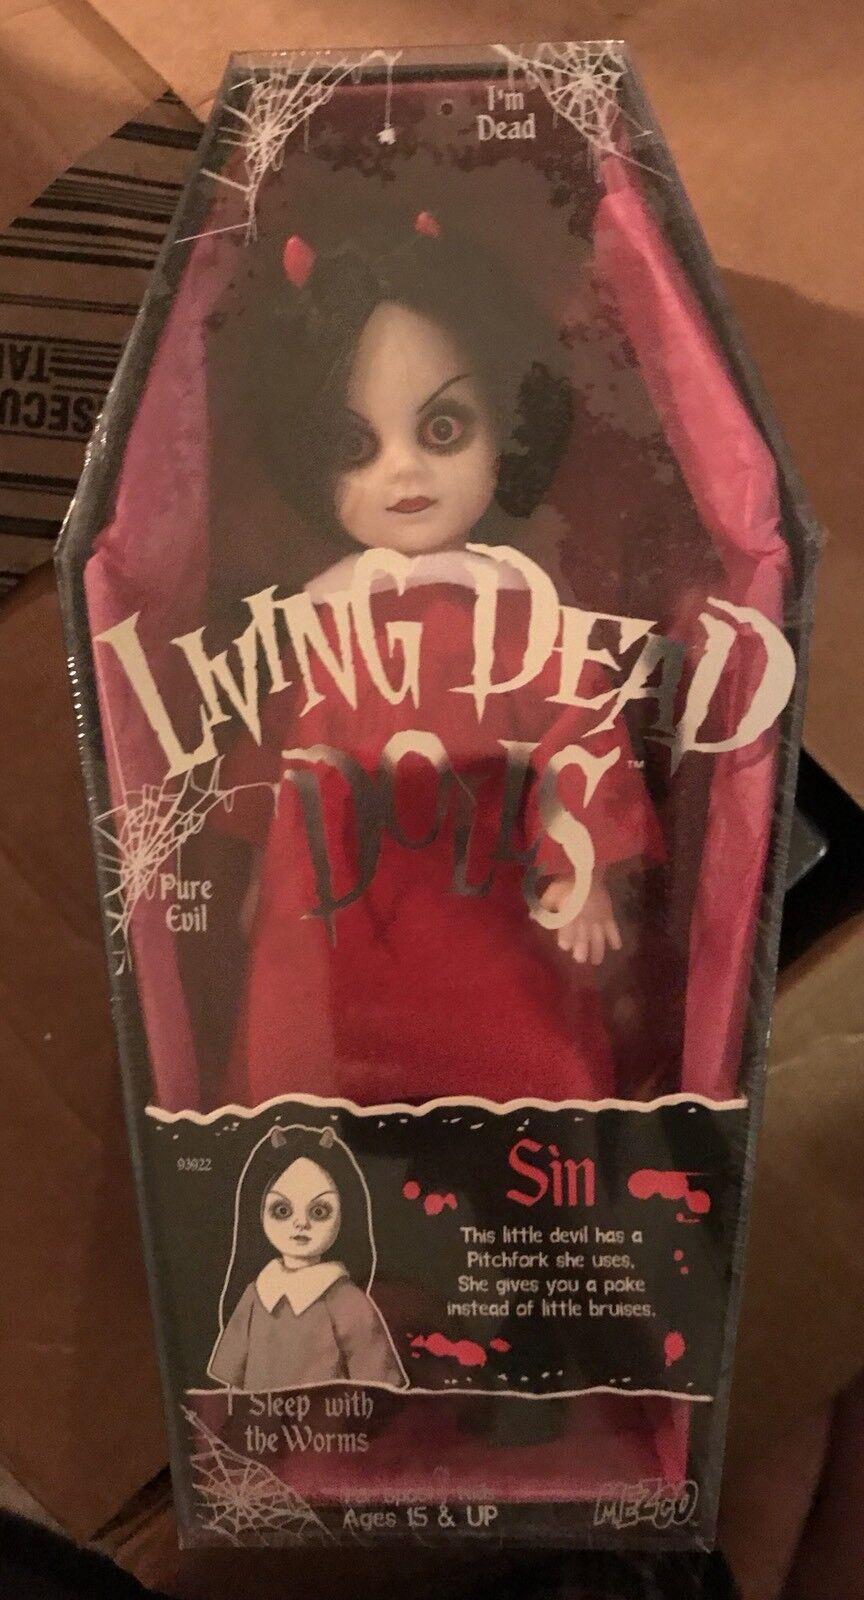 Livig Puppen Sin 13th Anniversary Ovp